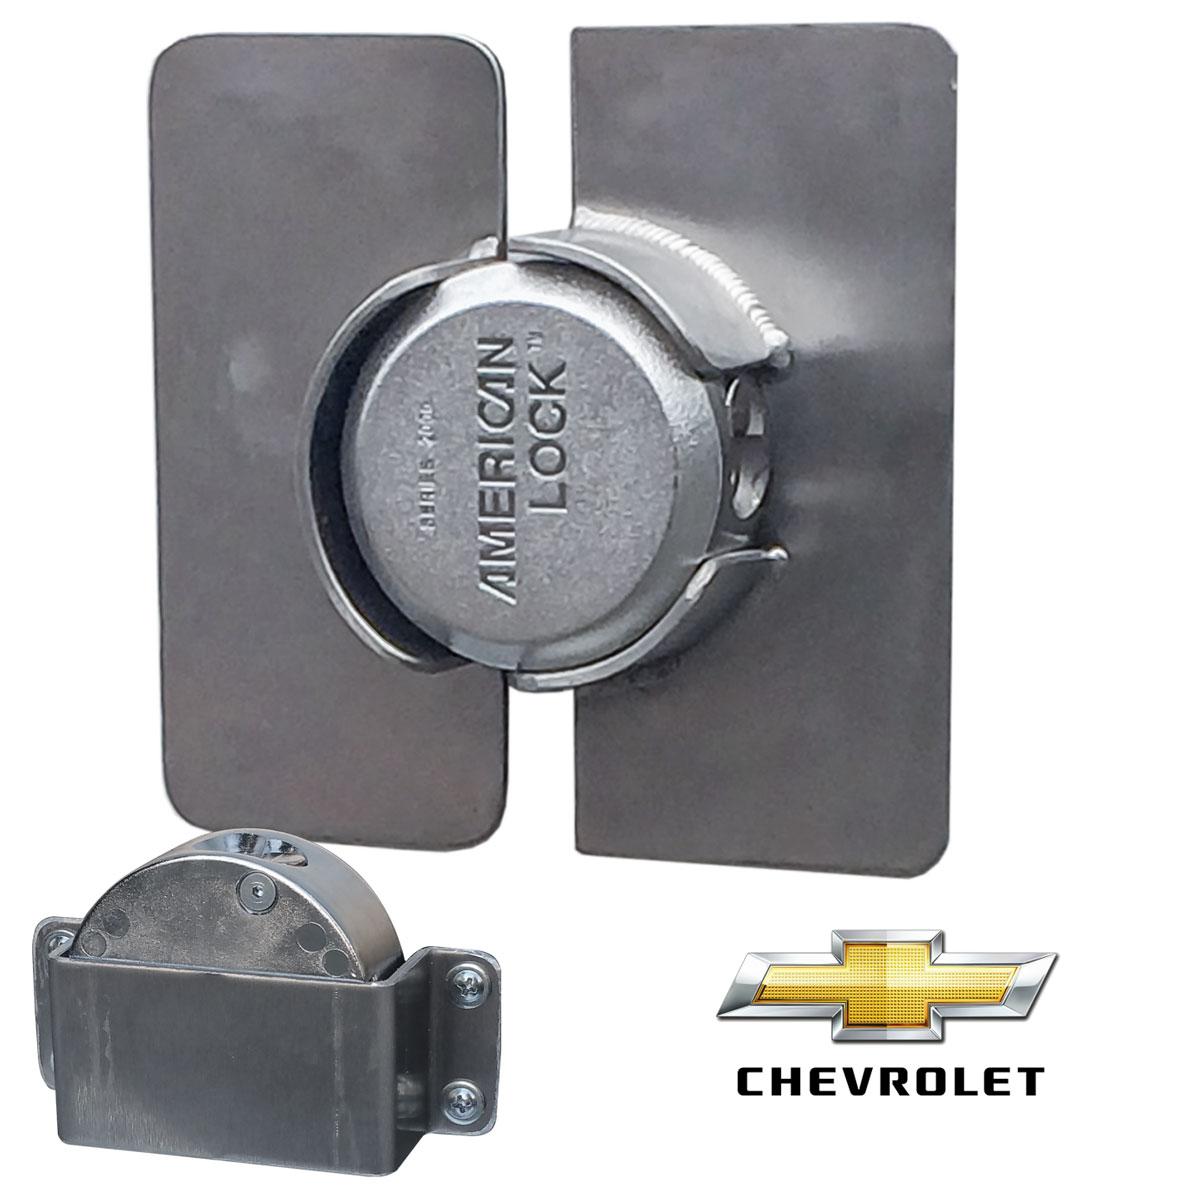 Chevy CargoPuck Lock Kit Sliding DoorSKU: 170012